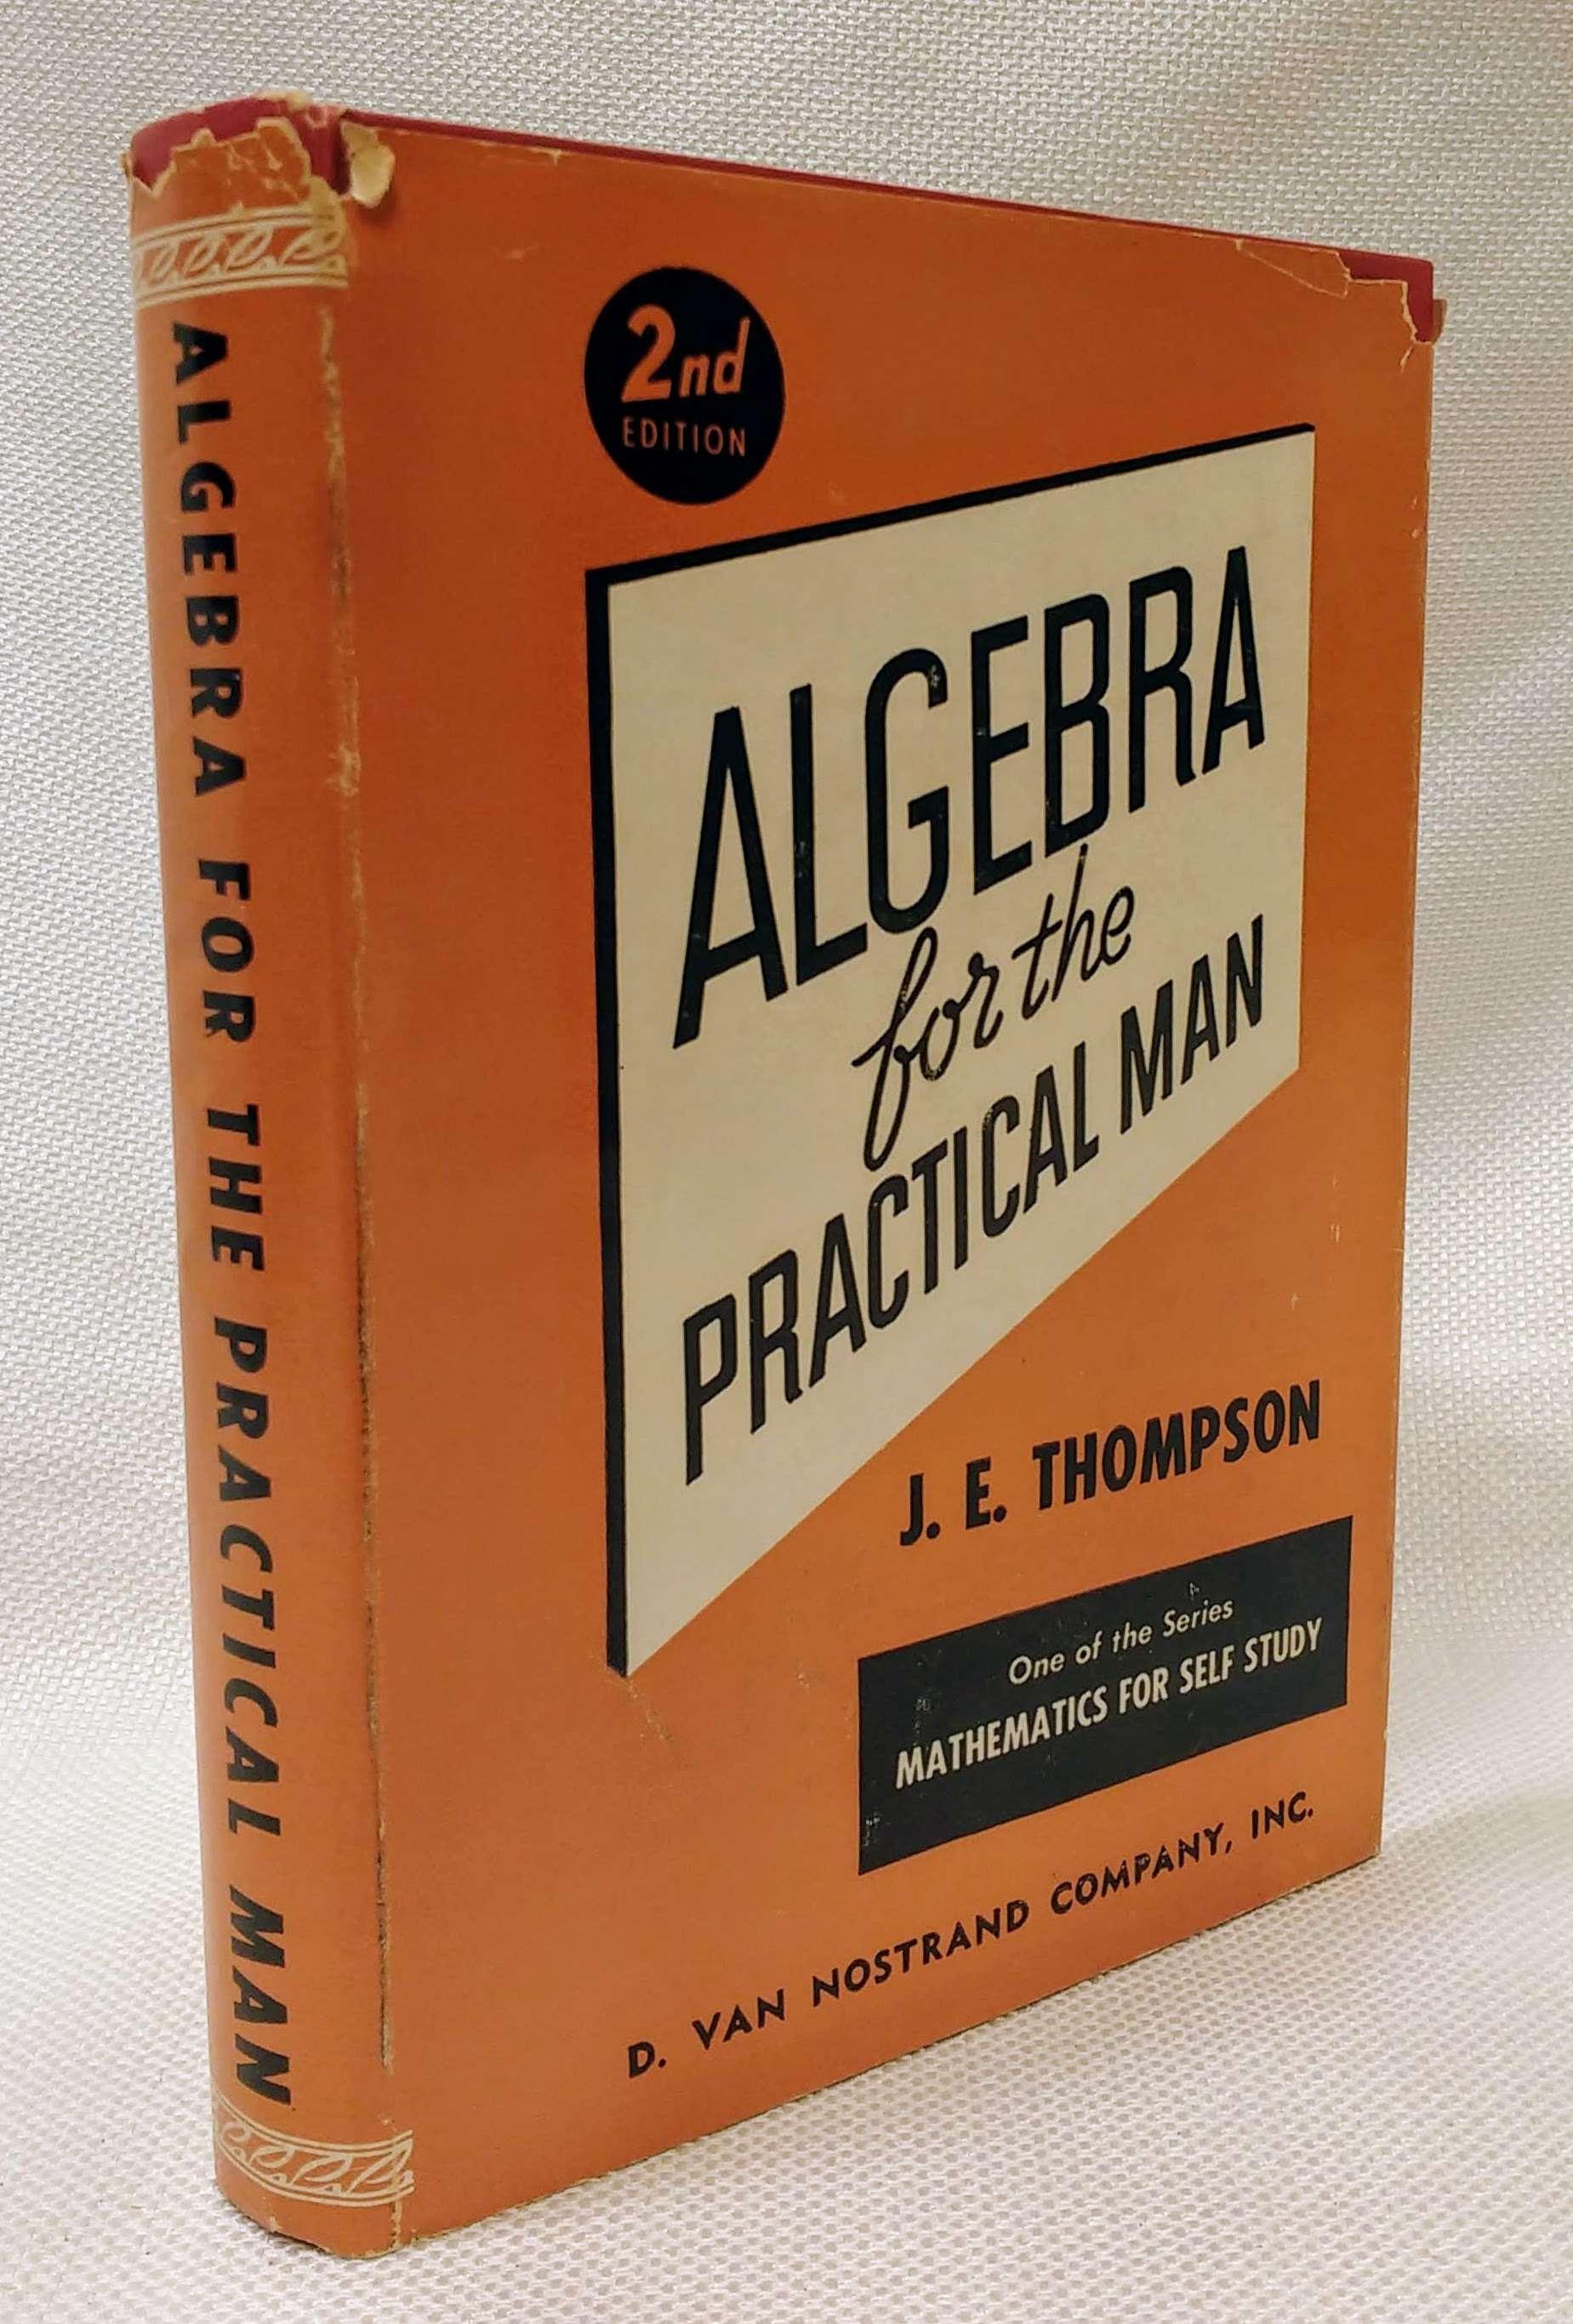 Algebra for the practical man, (Mathematics for self study), Thompson, James Edgar